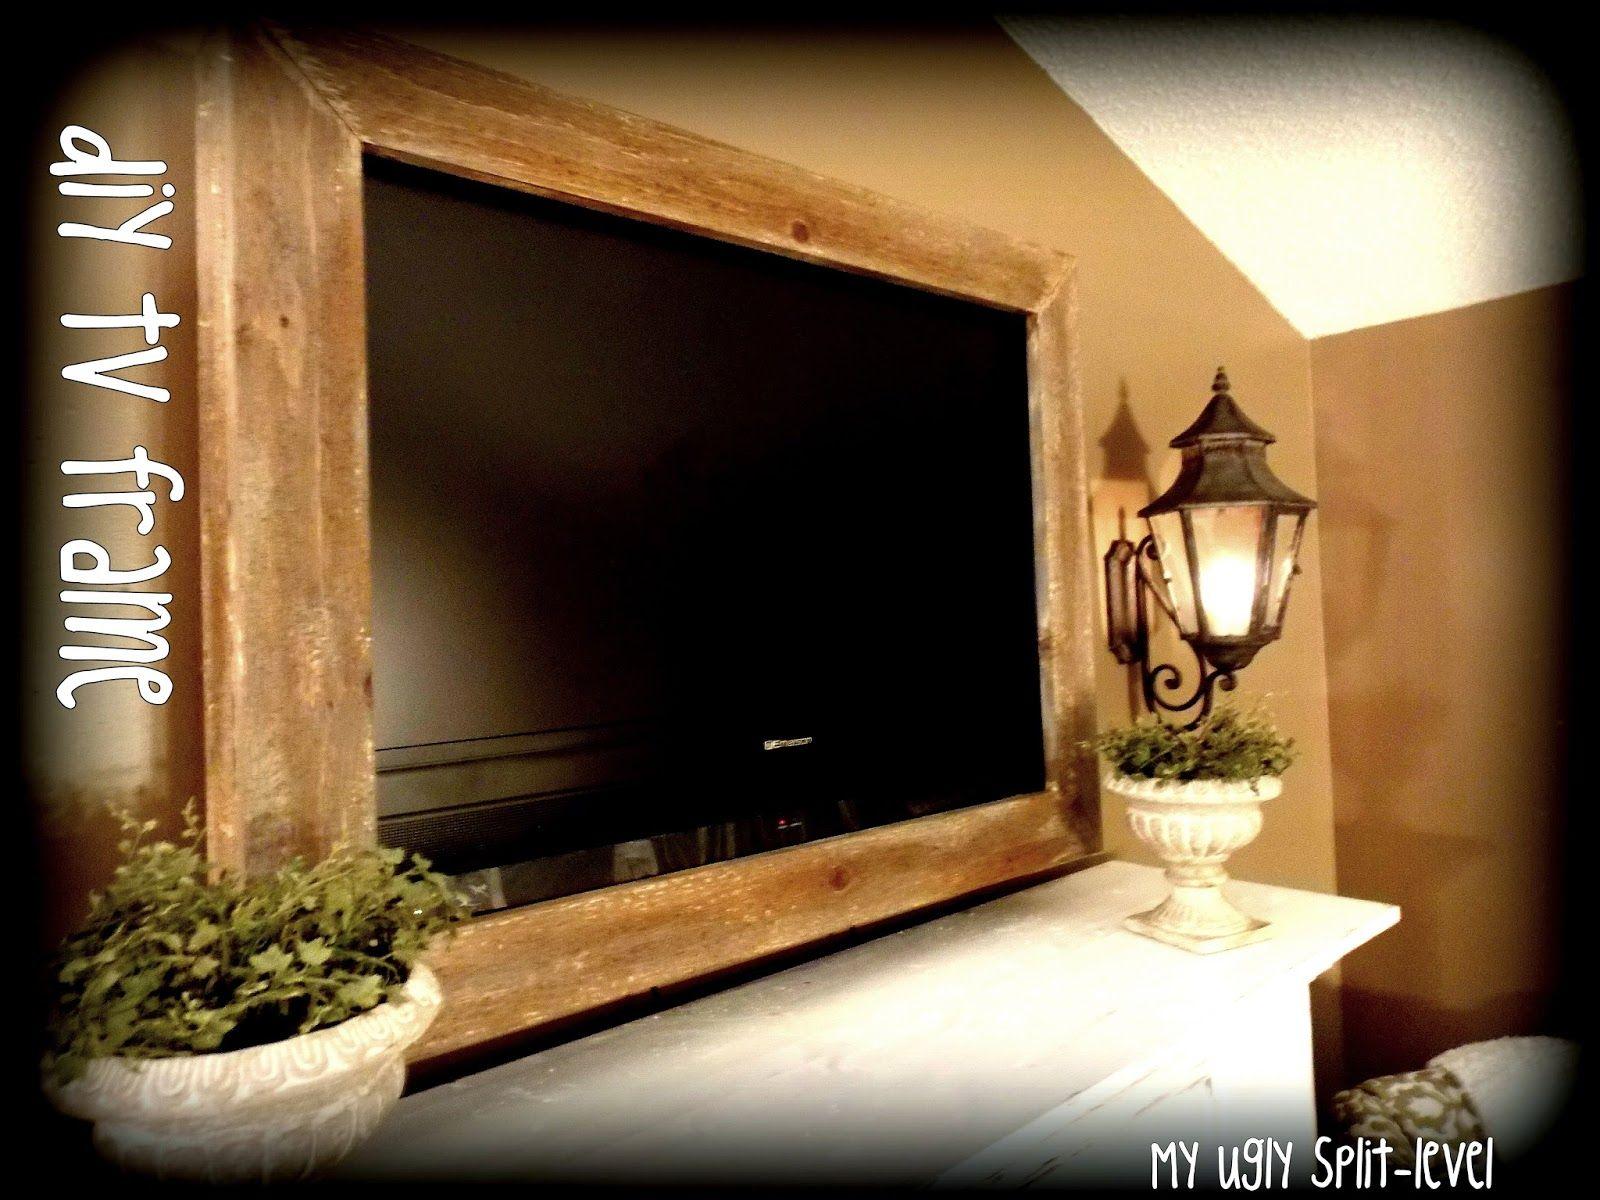 My Ugly Split-level: DIY Barn Wood TV Frame | DIY Home | Pinterest ...